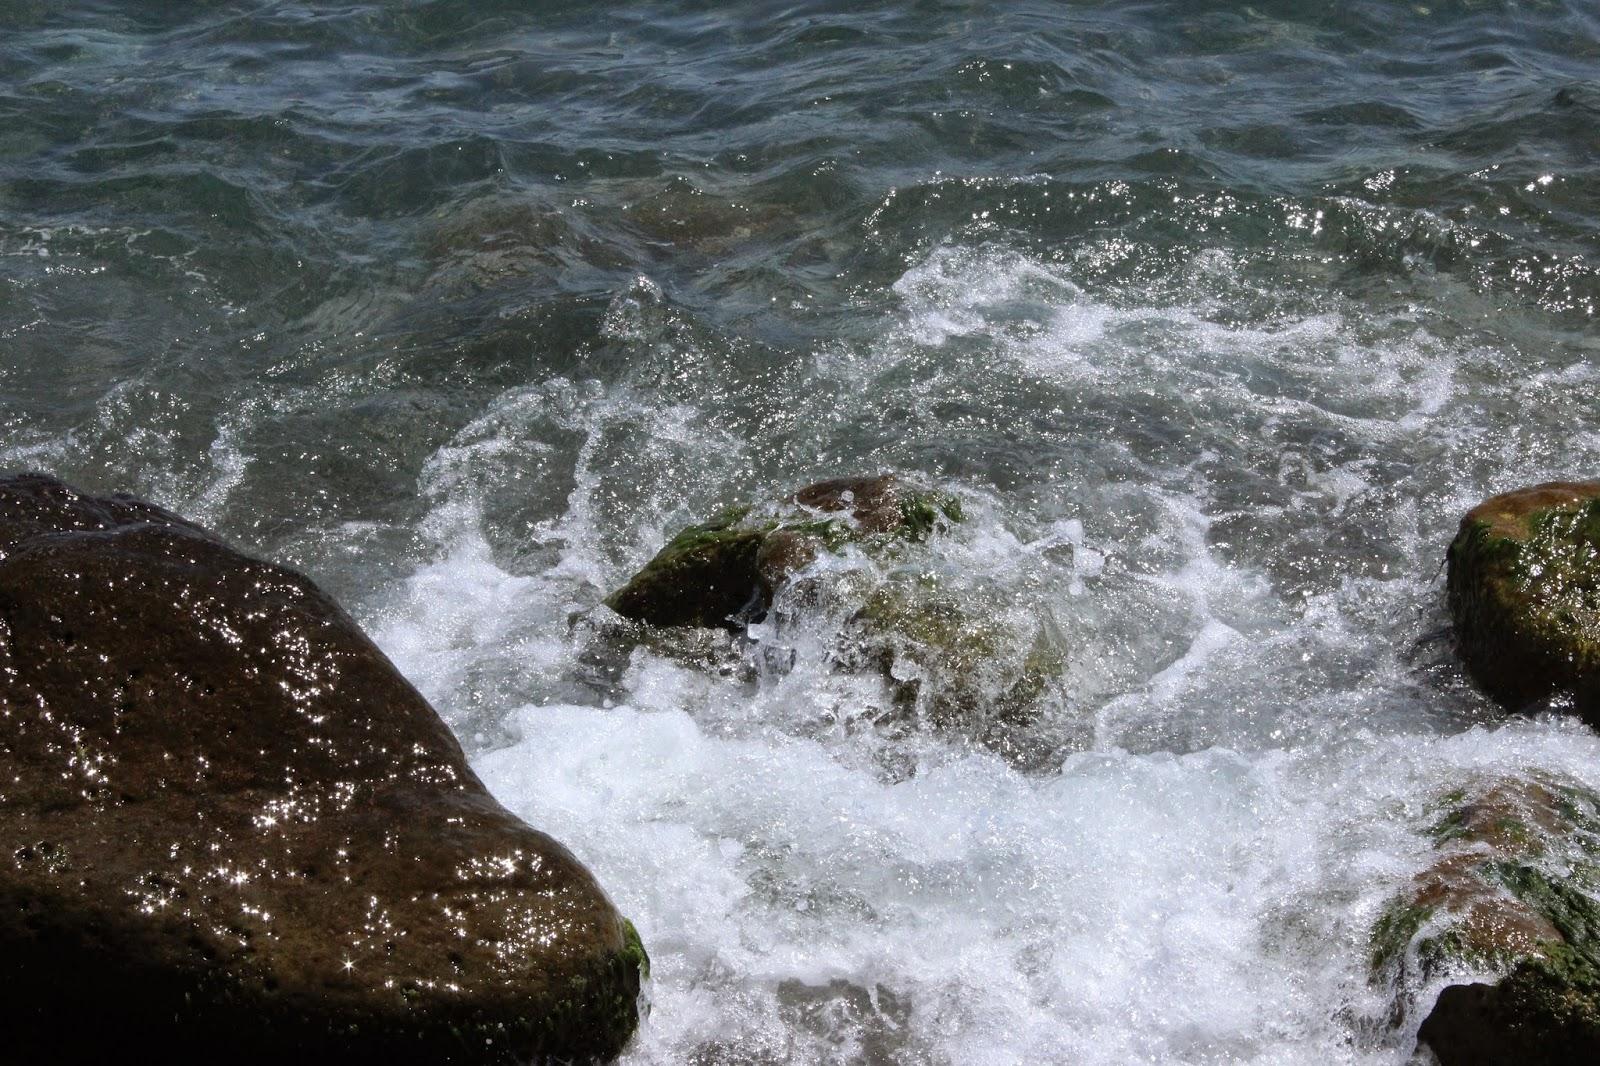 море, прибой, камни, морская пена, Ялта, берег моря